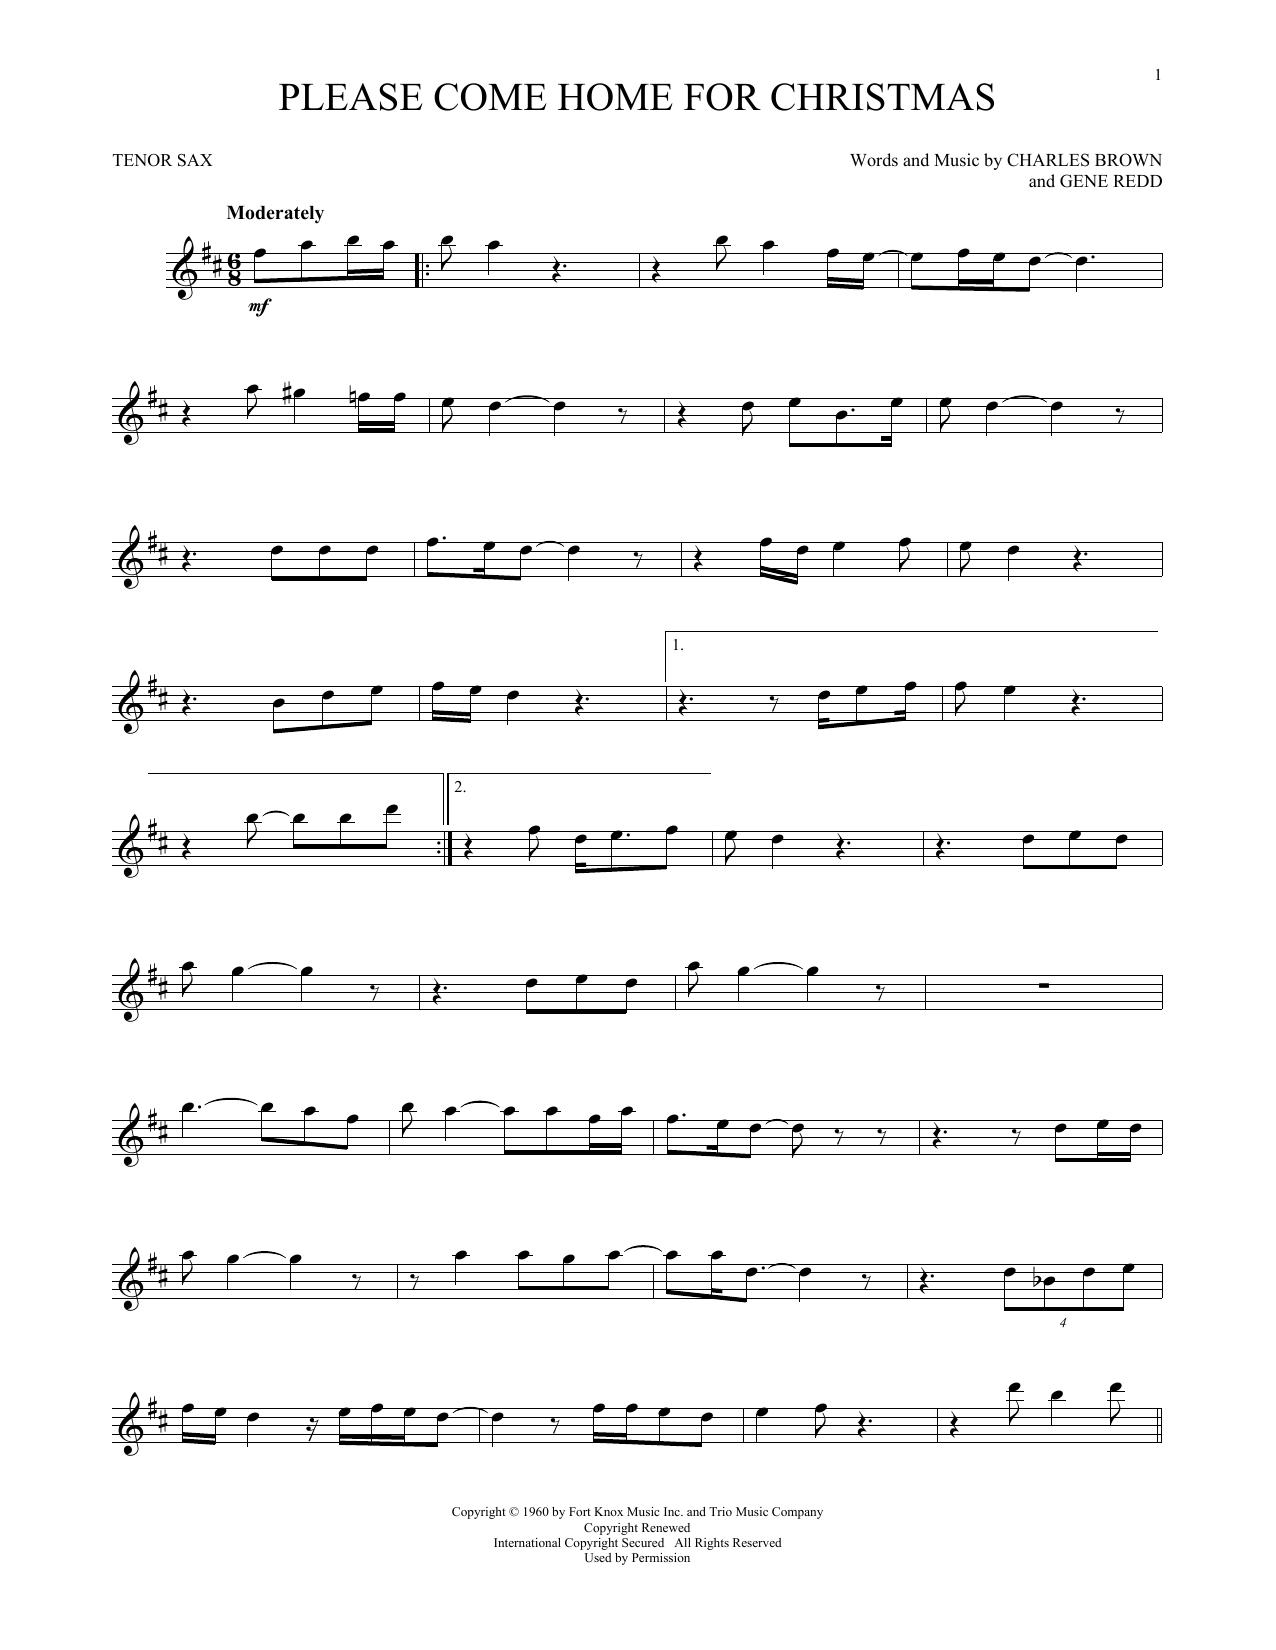 Please Come Home For Christmas (Tenor Sax Solo)